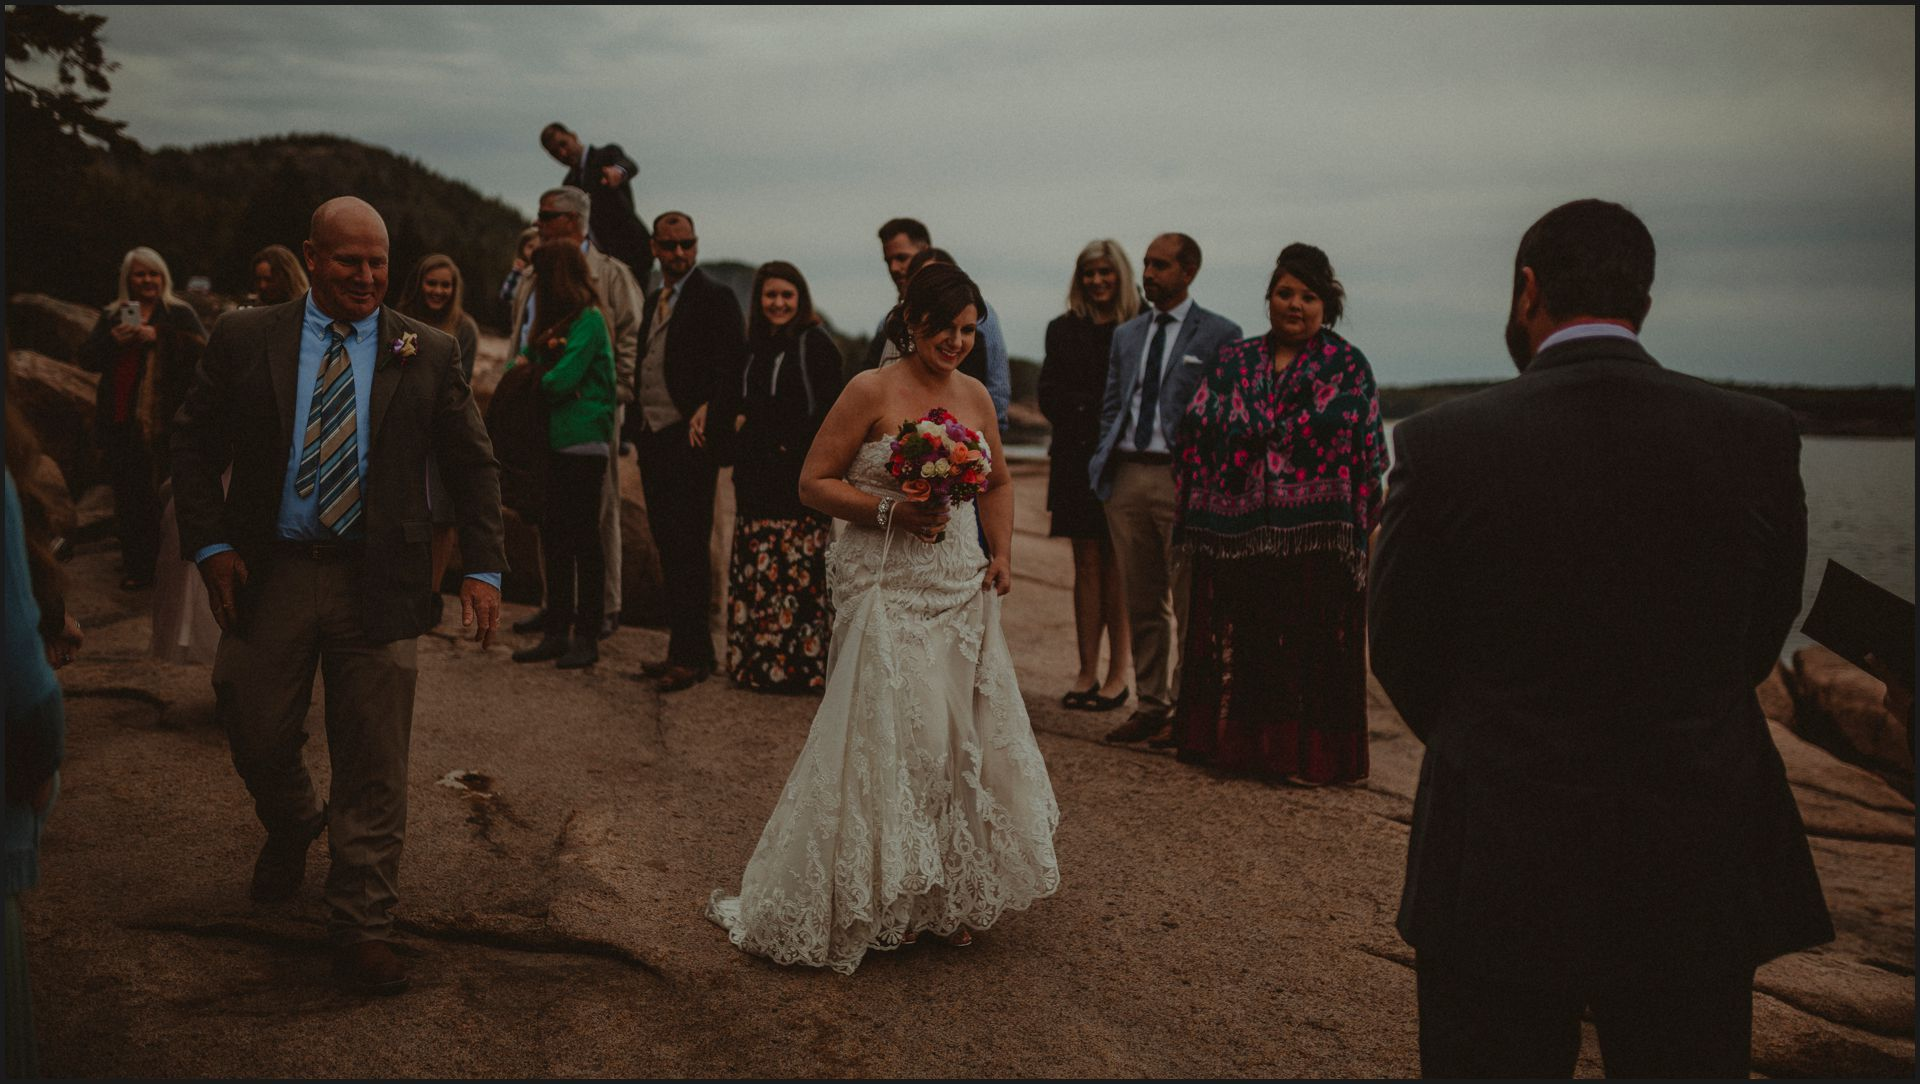 walking the aisle, wedding, maine, acadia national park, bar harbor, cliff, bridal dress, bride